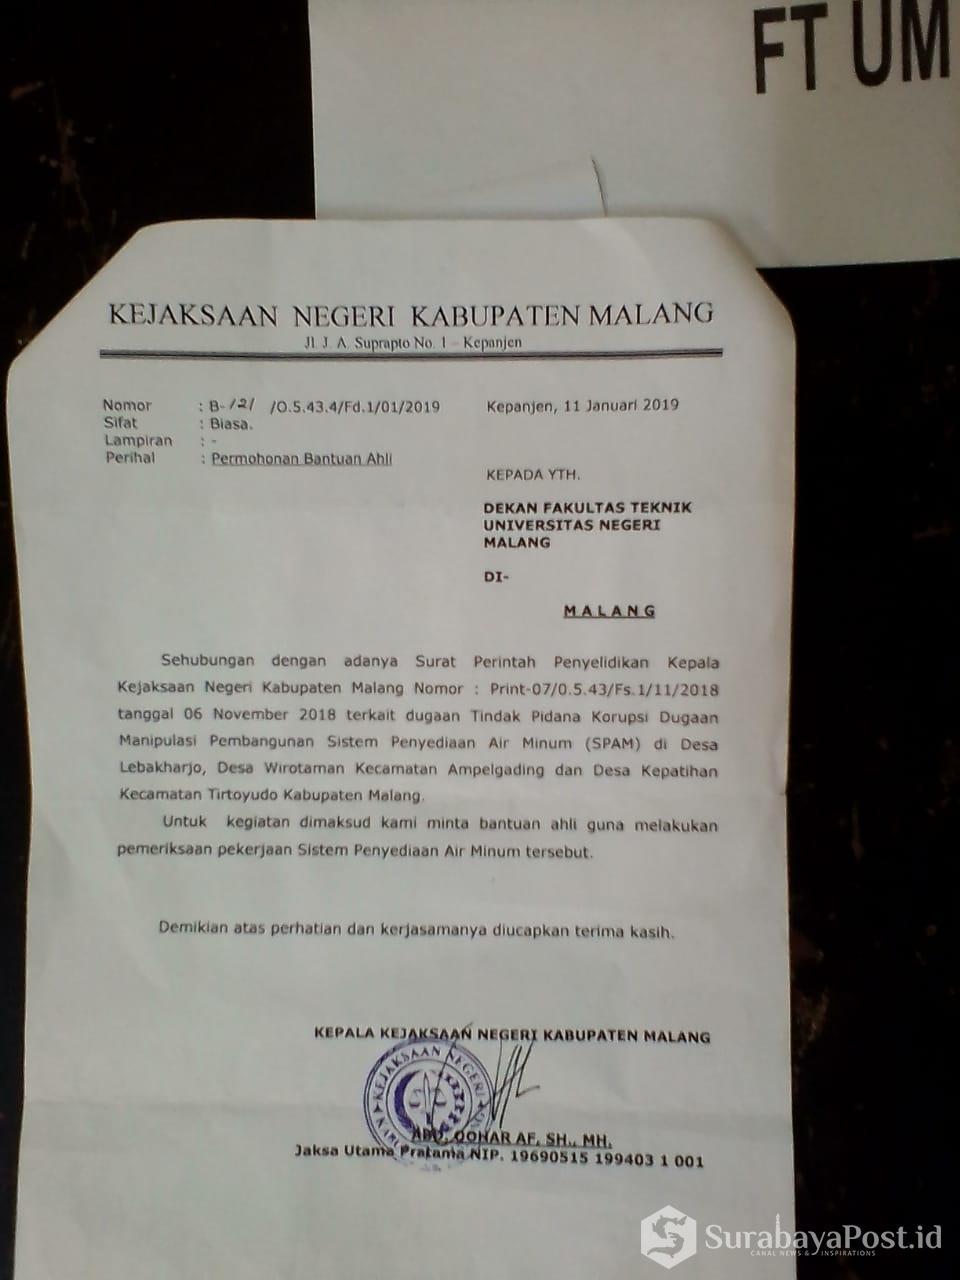 Surat permohonan bantuan saksi ahli ke PTN di Malang